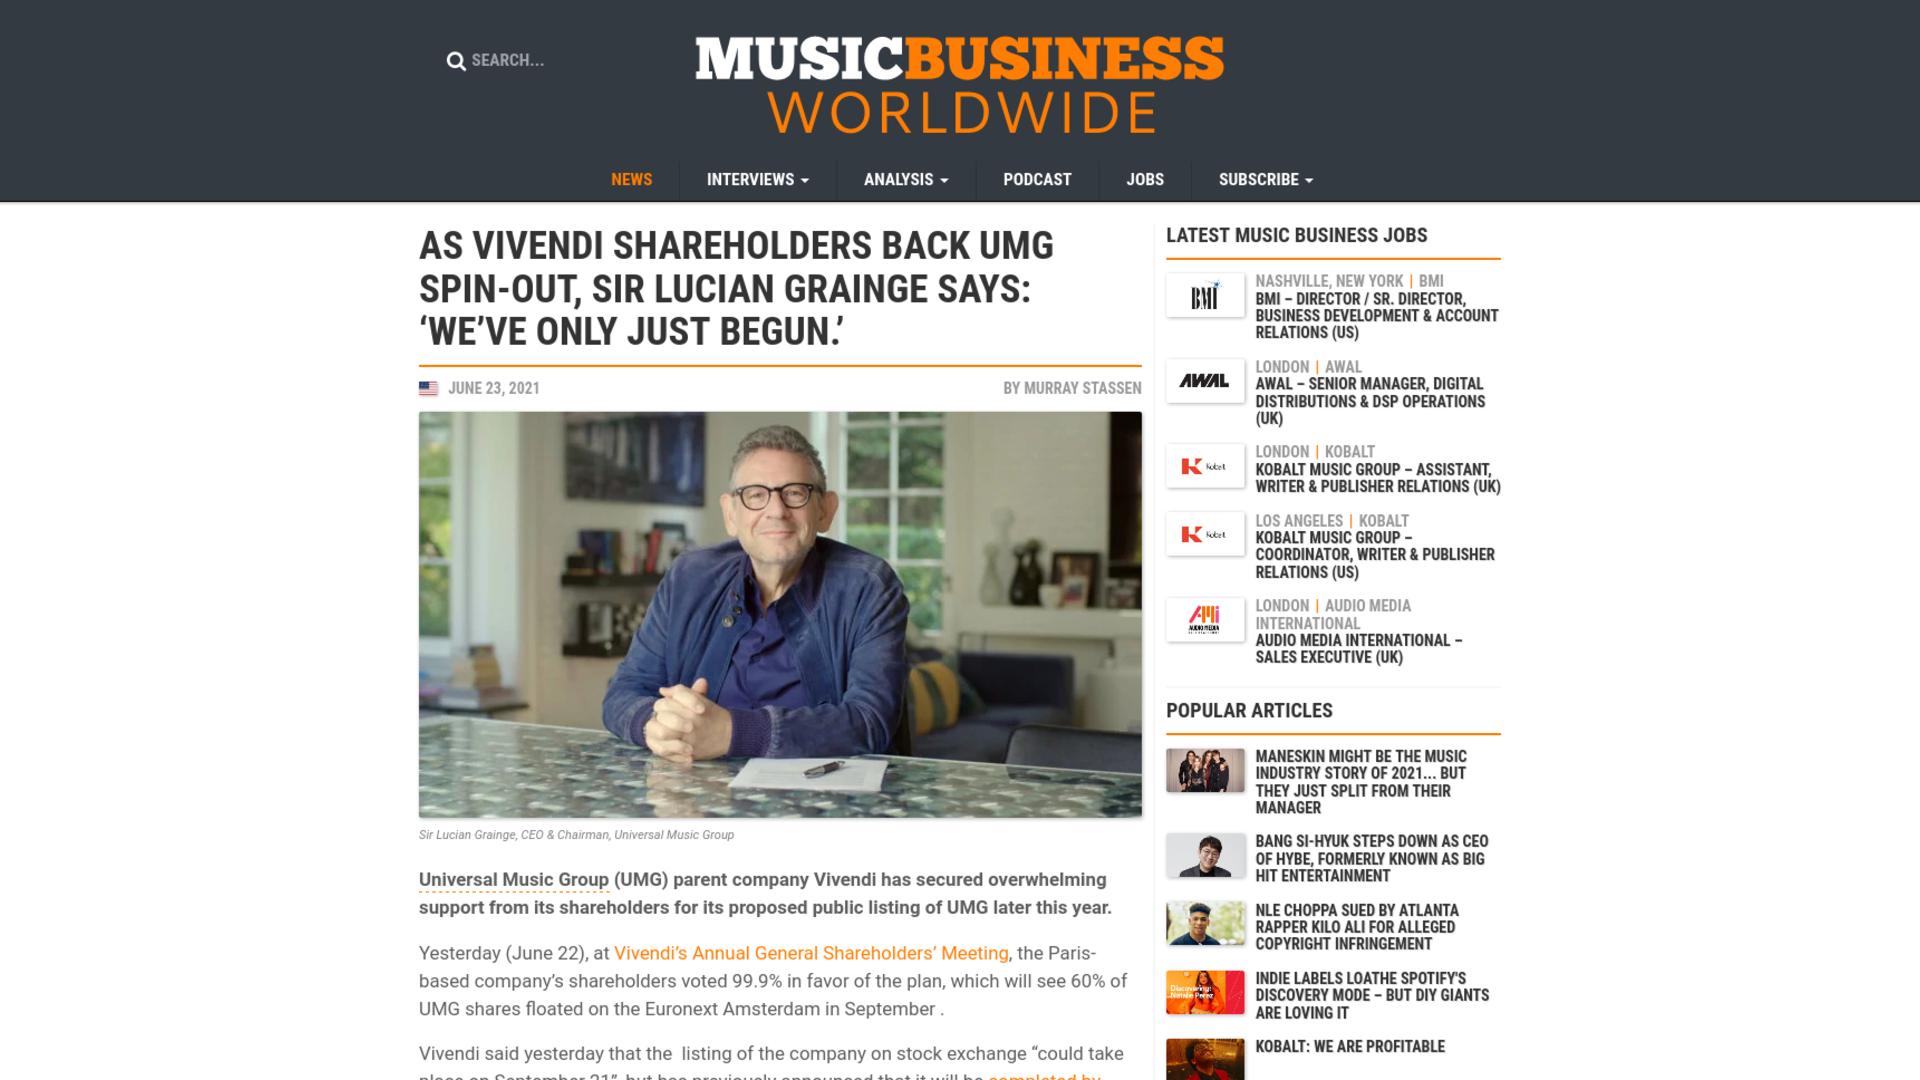 Fairness Rocks News As Vivendi shareholders back UMG spin-out, Sir Lucian Grainge says: 'We've only just begun.'